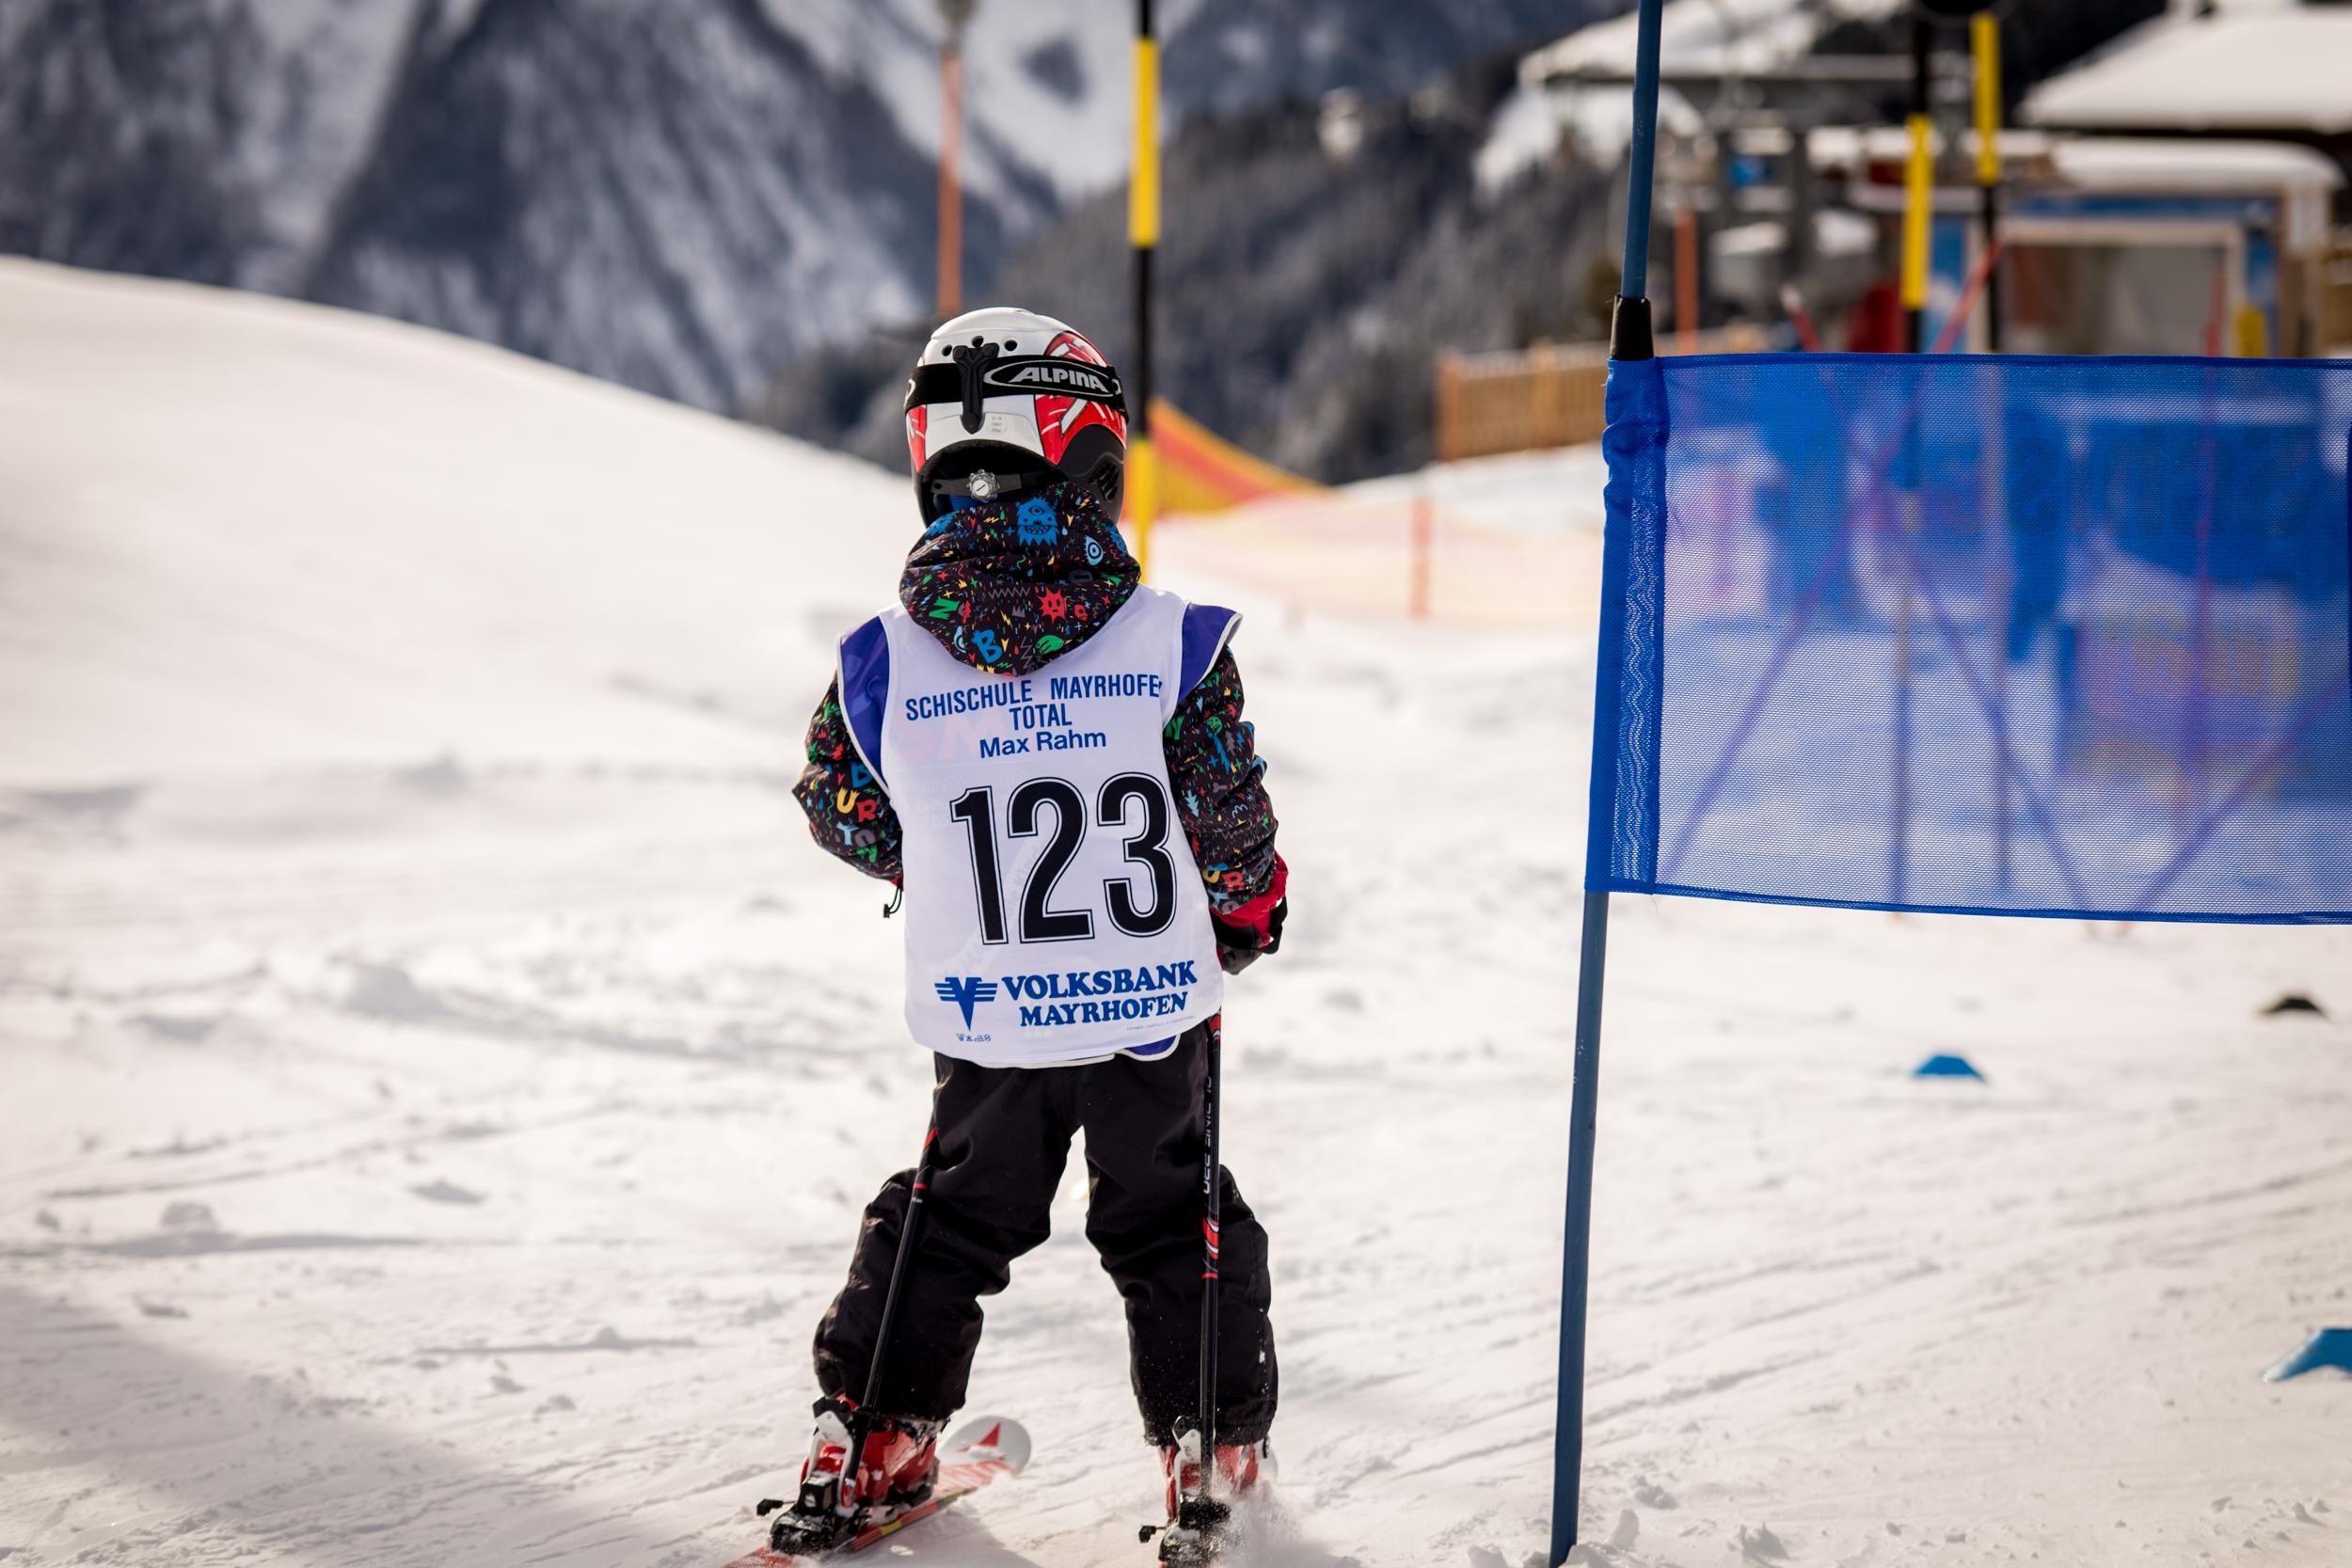 ski race 16_0093.jpg